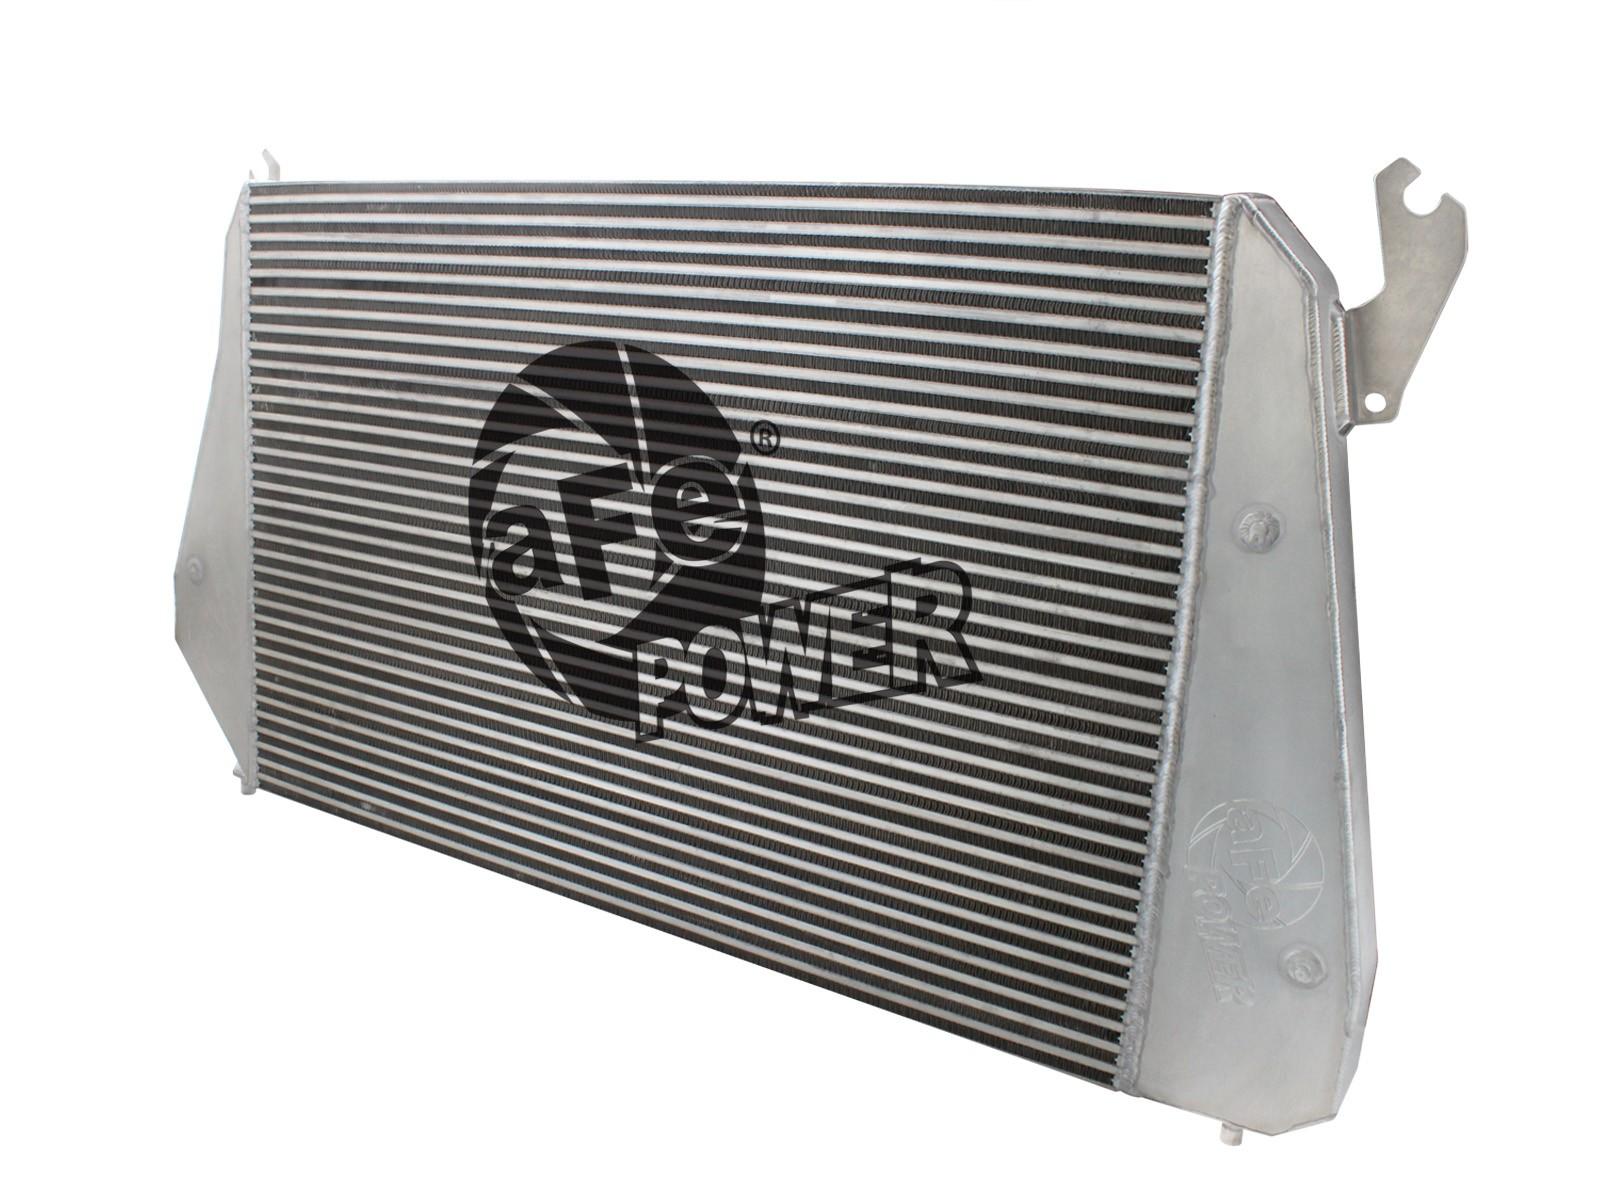 aFe POWER 46-20111 BladeRunner GT Series Intercooler